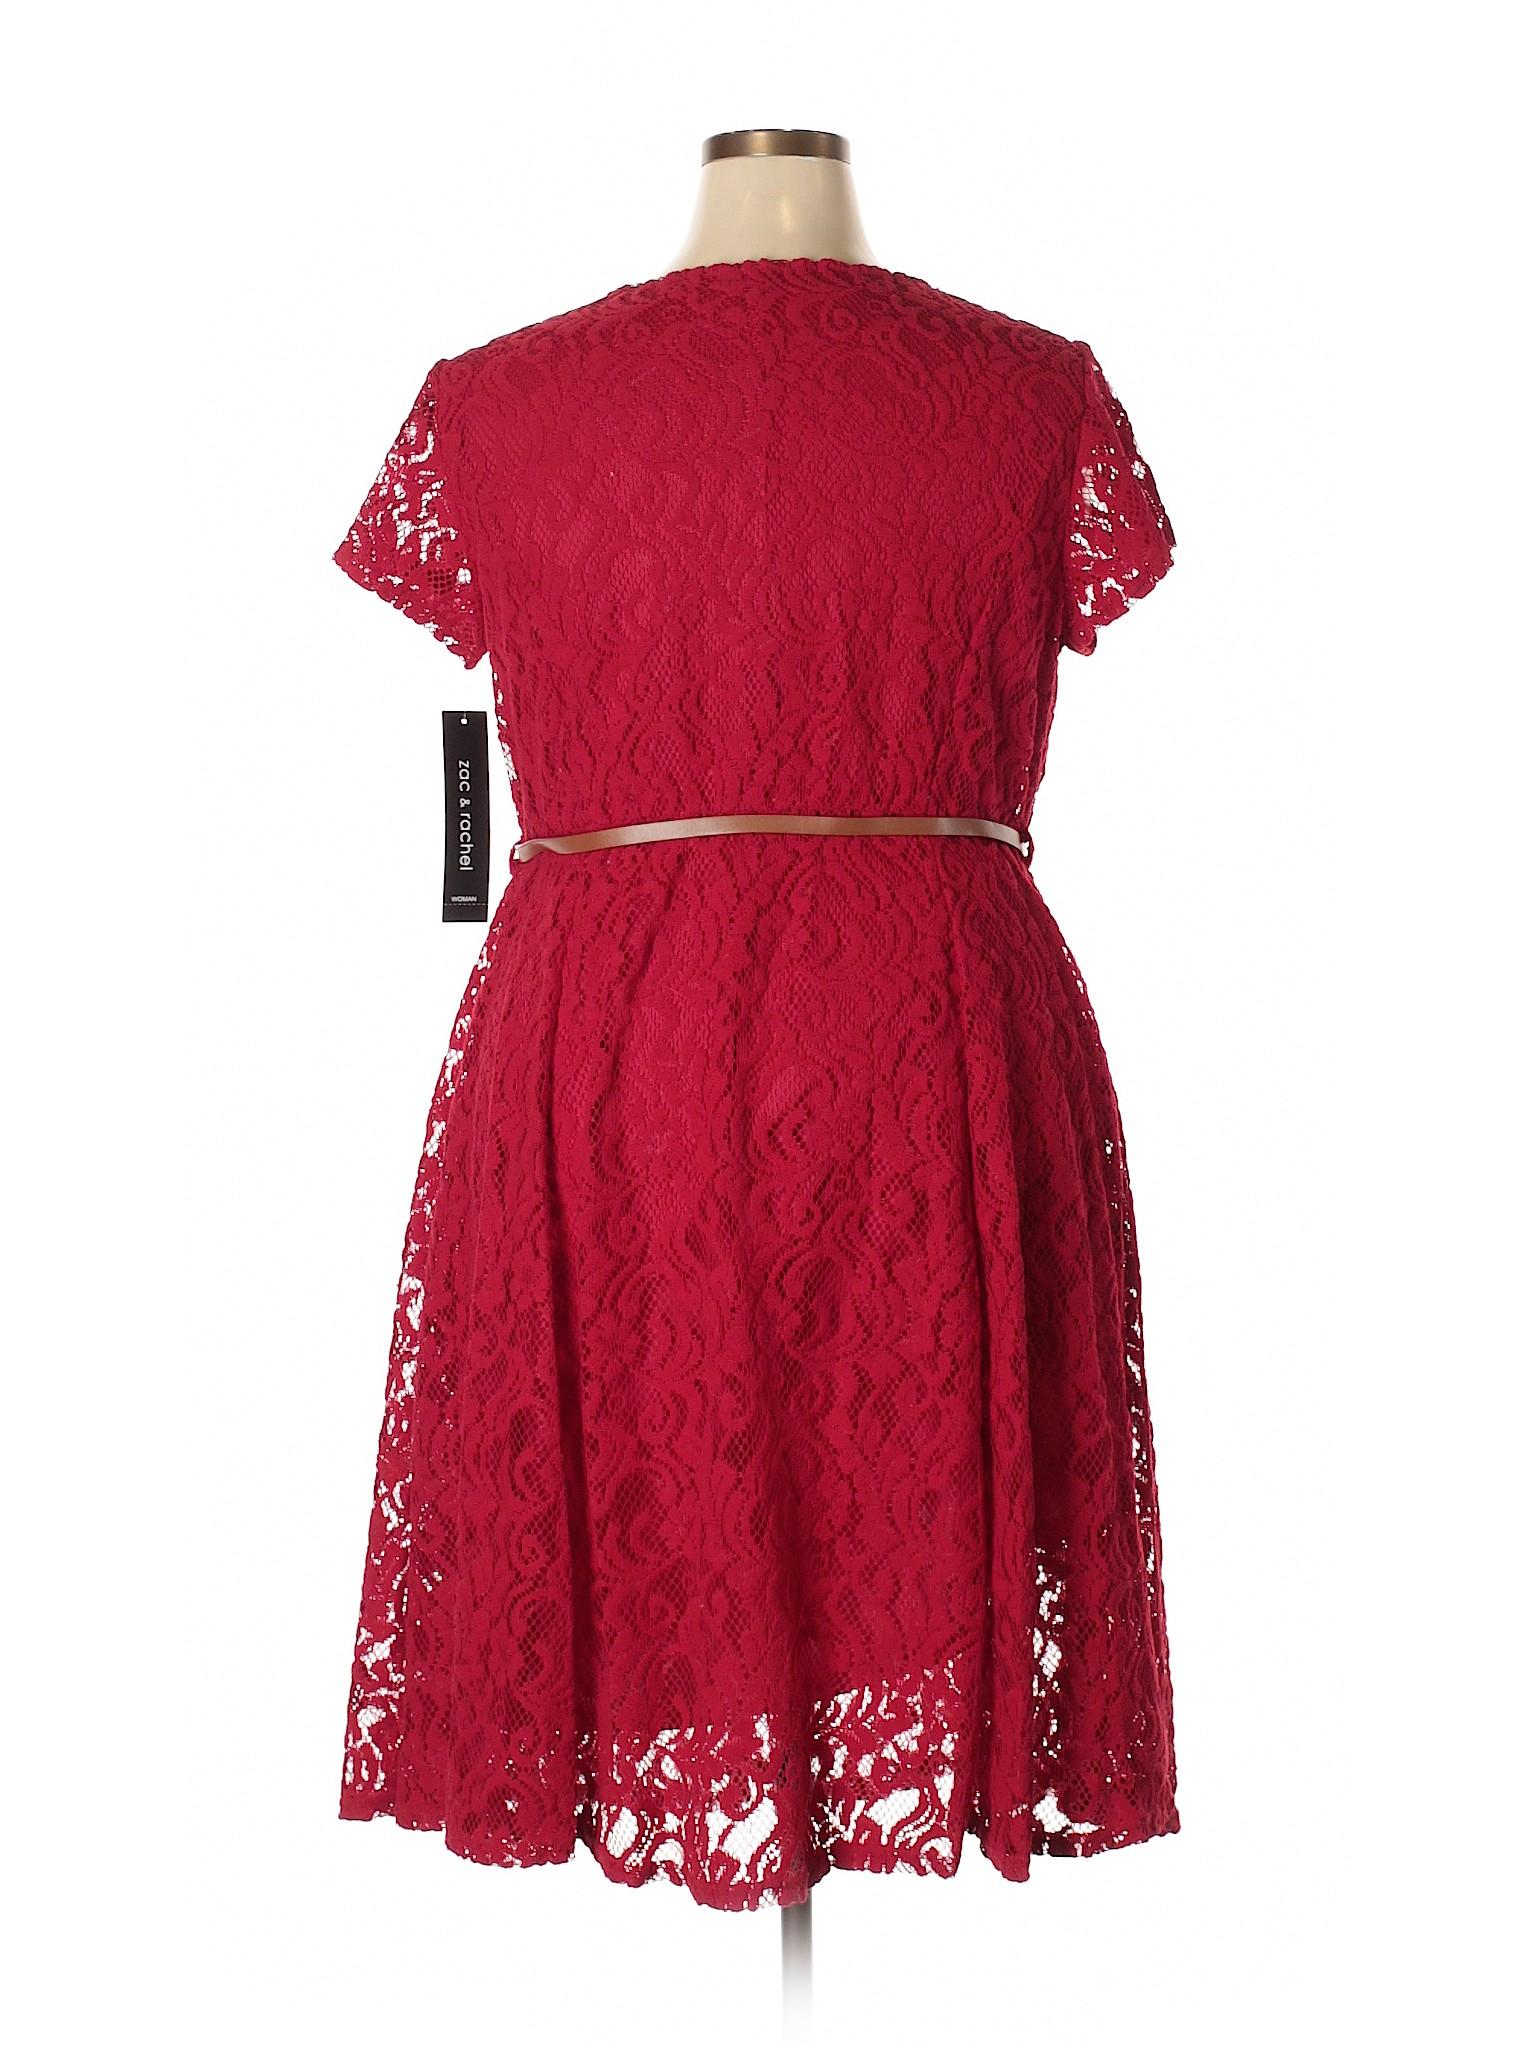 Rachel Casual Dress Selling Zac amp; YBqnxB7P